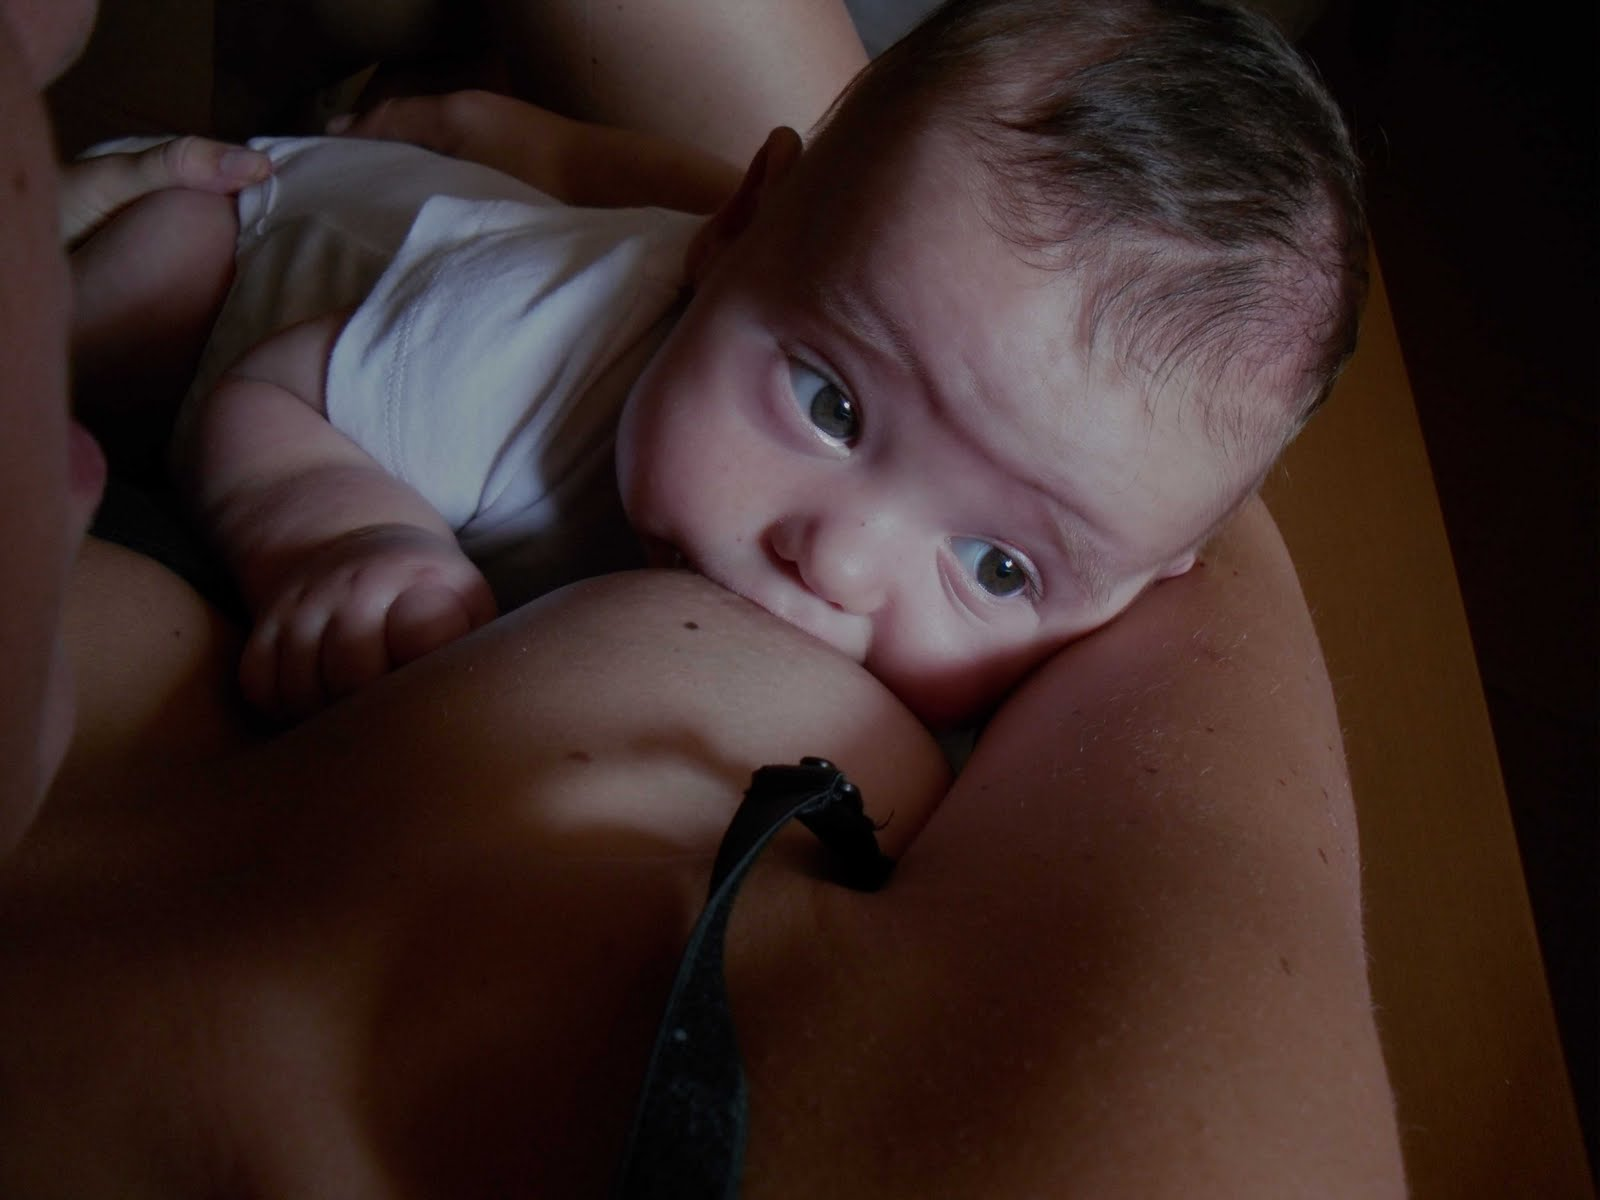 Teta - lactancia materna